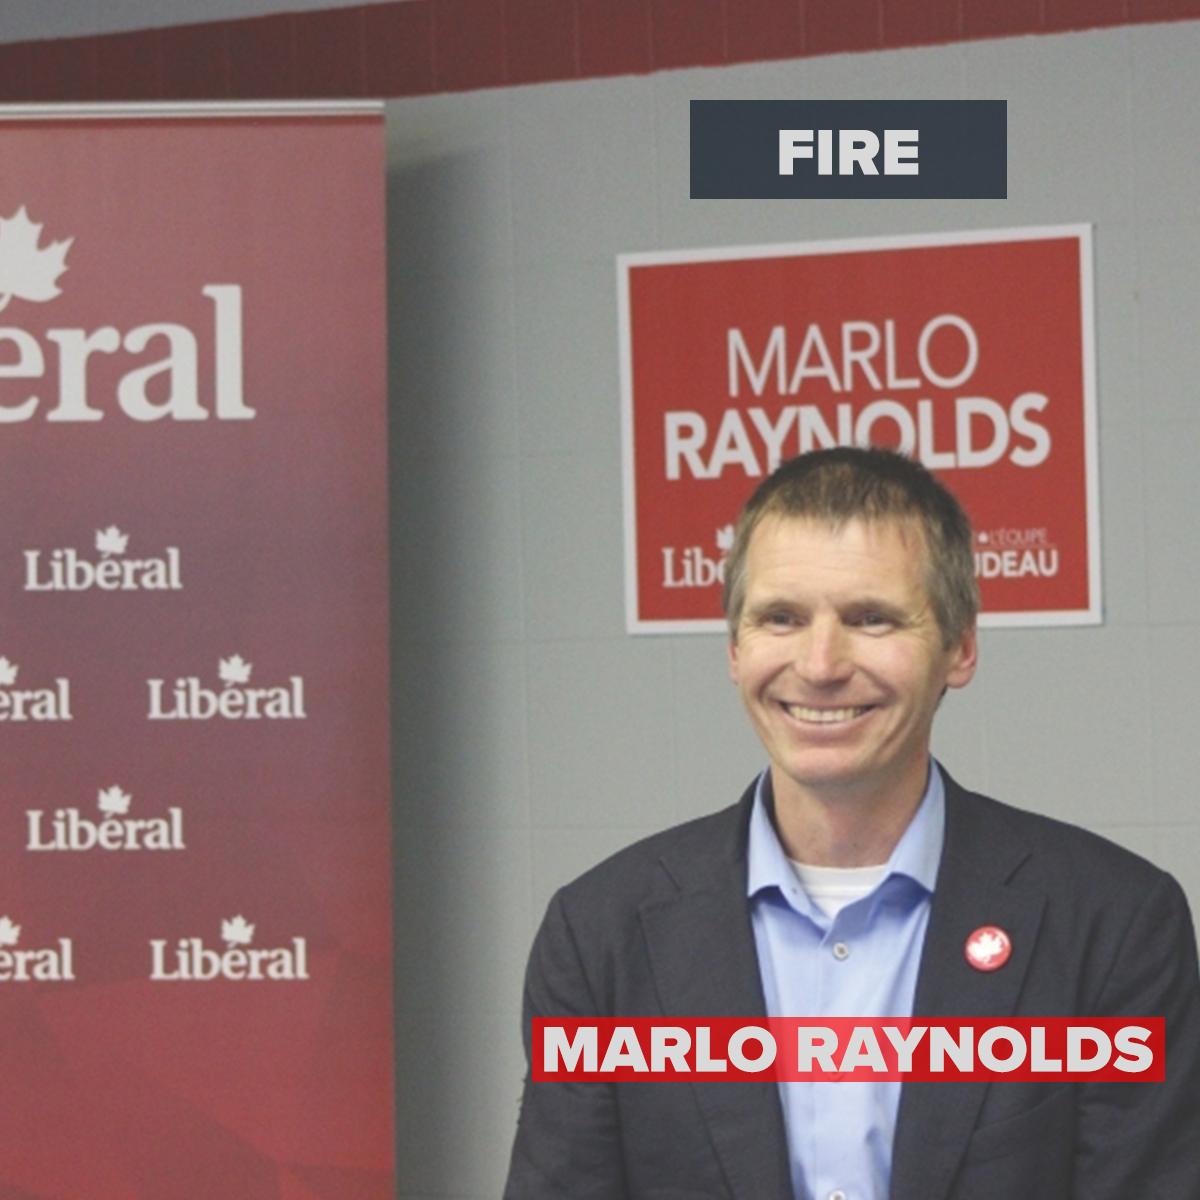 Fire Marlo Raynolds